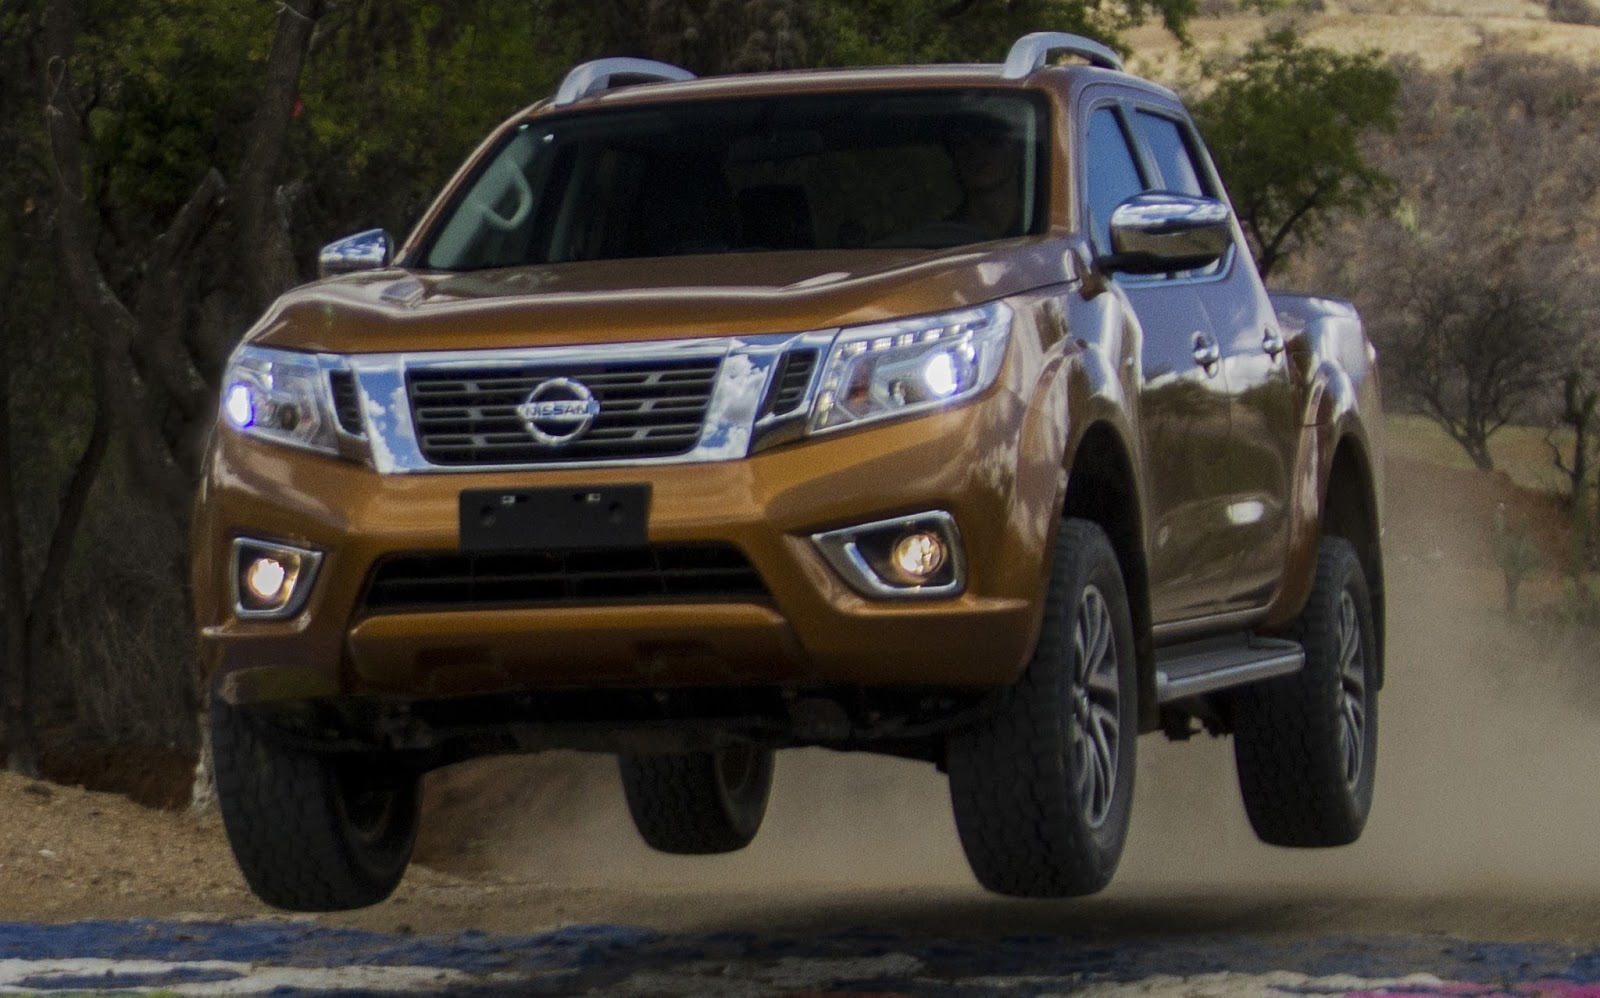 Nova Frontier Nissan 2016 Nova Nissan Frontier 2016